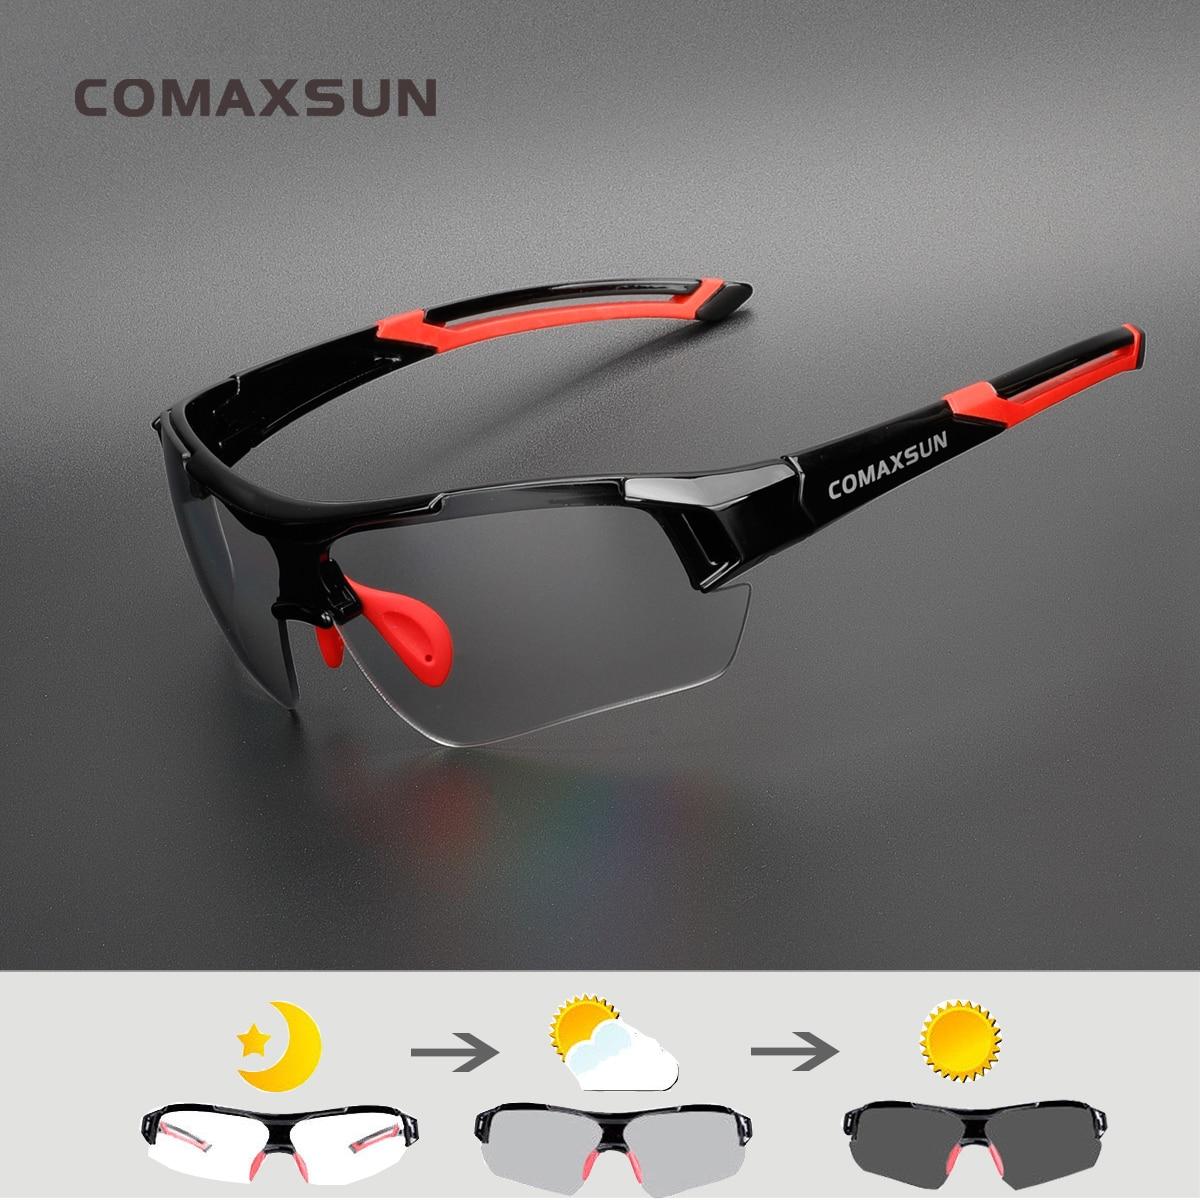 COMAXSUN Photochromic Cycling Glasses Discoloration Glasses MTB Road Bike Sport Sunglasses Bike Eyewear Bicycle Goggles 2 Style